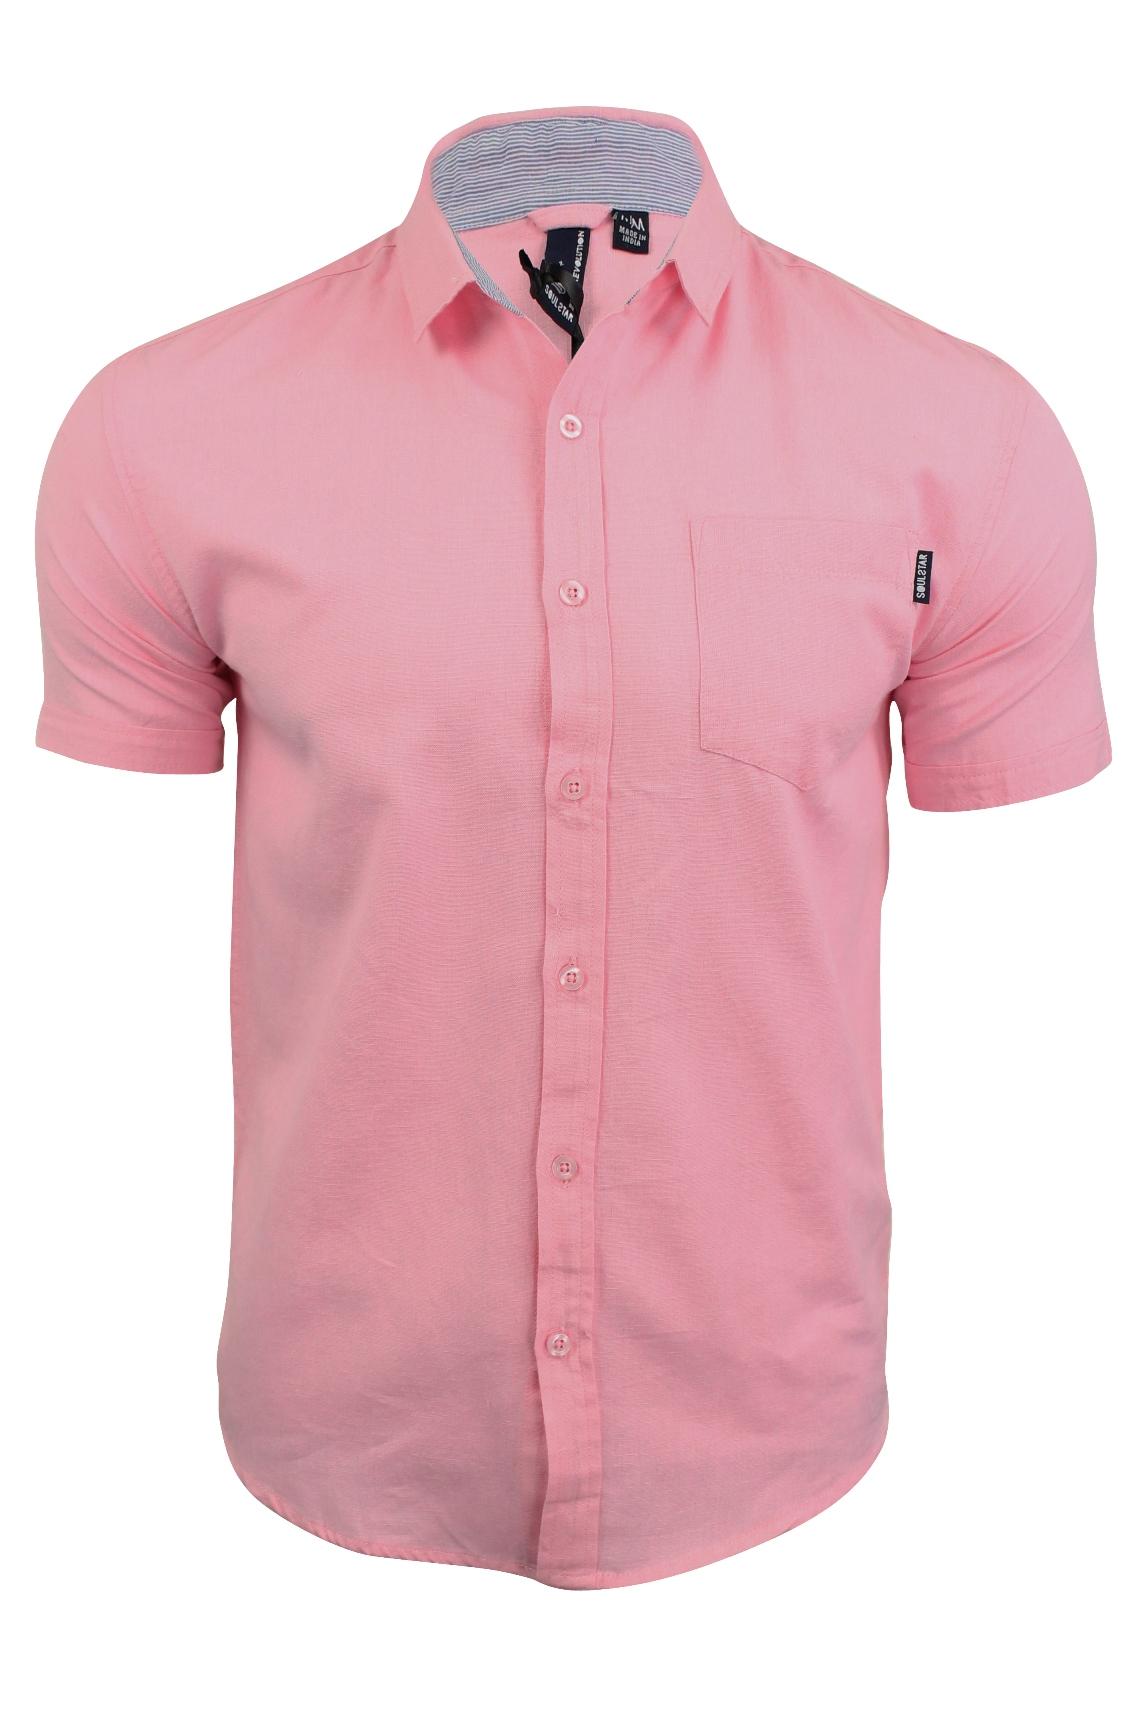 Mens linen shirt by soul star 39 cotlin 39 short sleeved for Mens short sleeve linen dress shirts